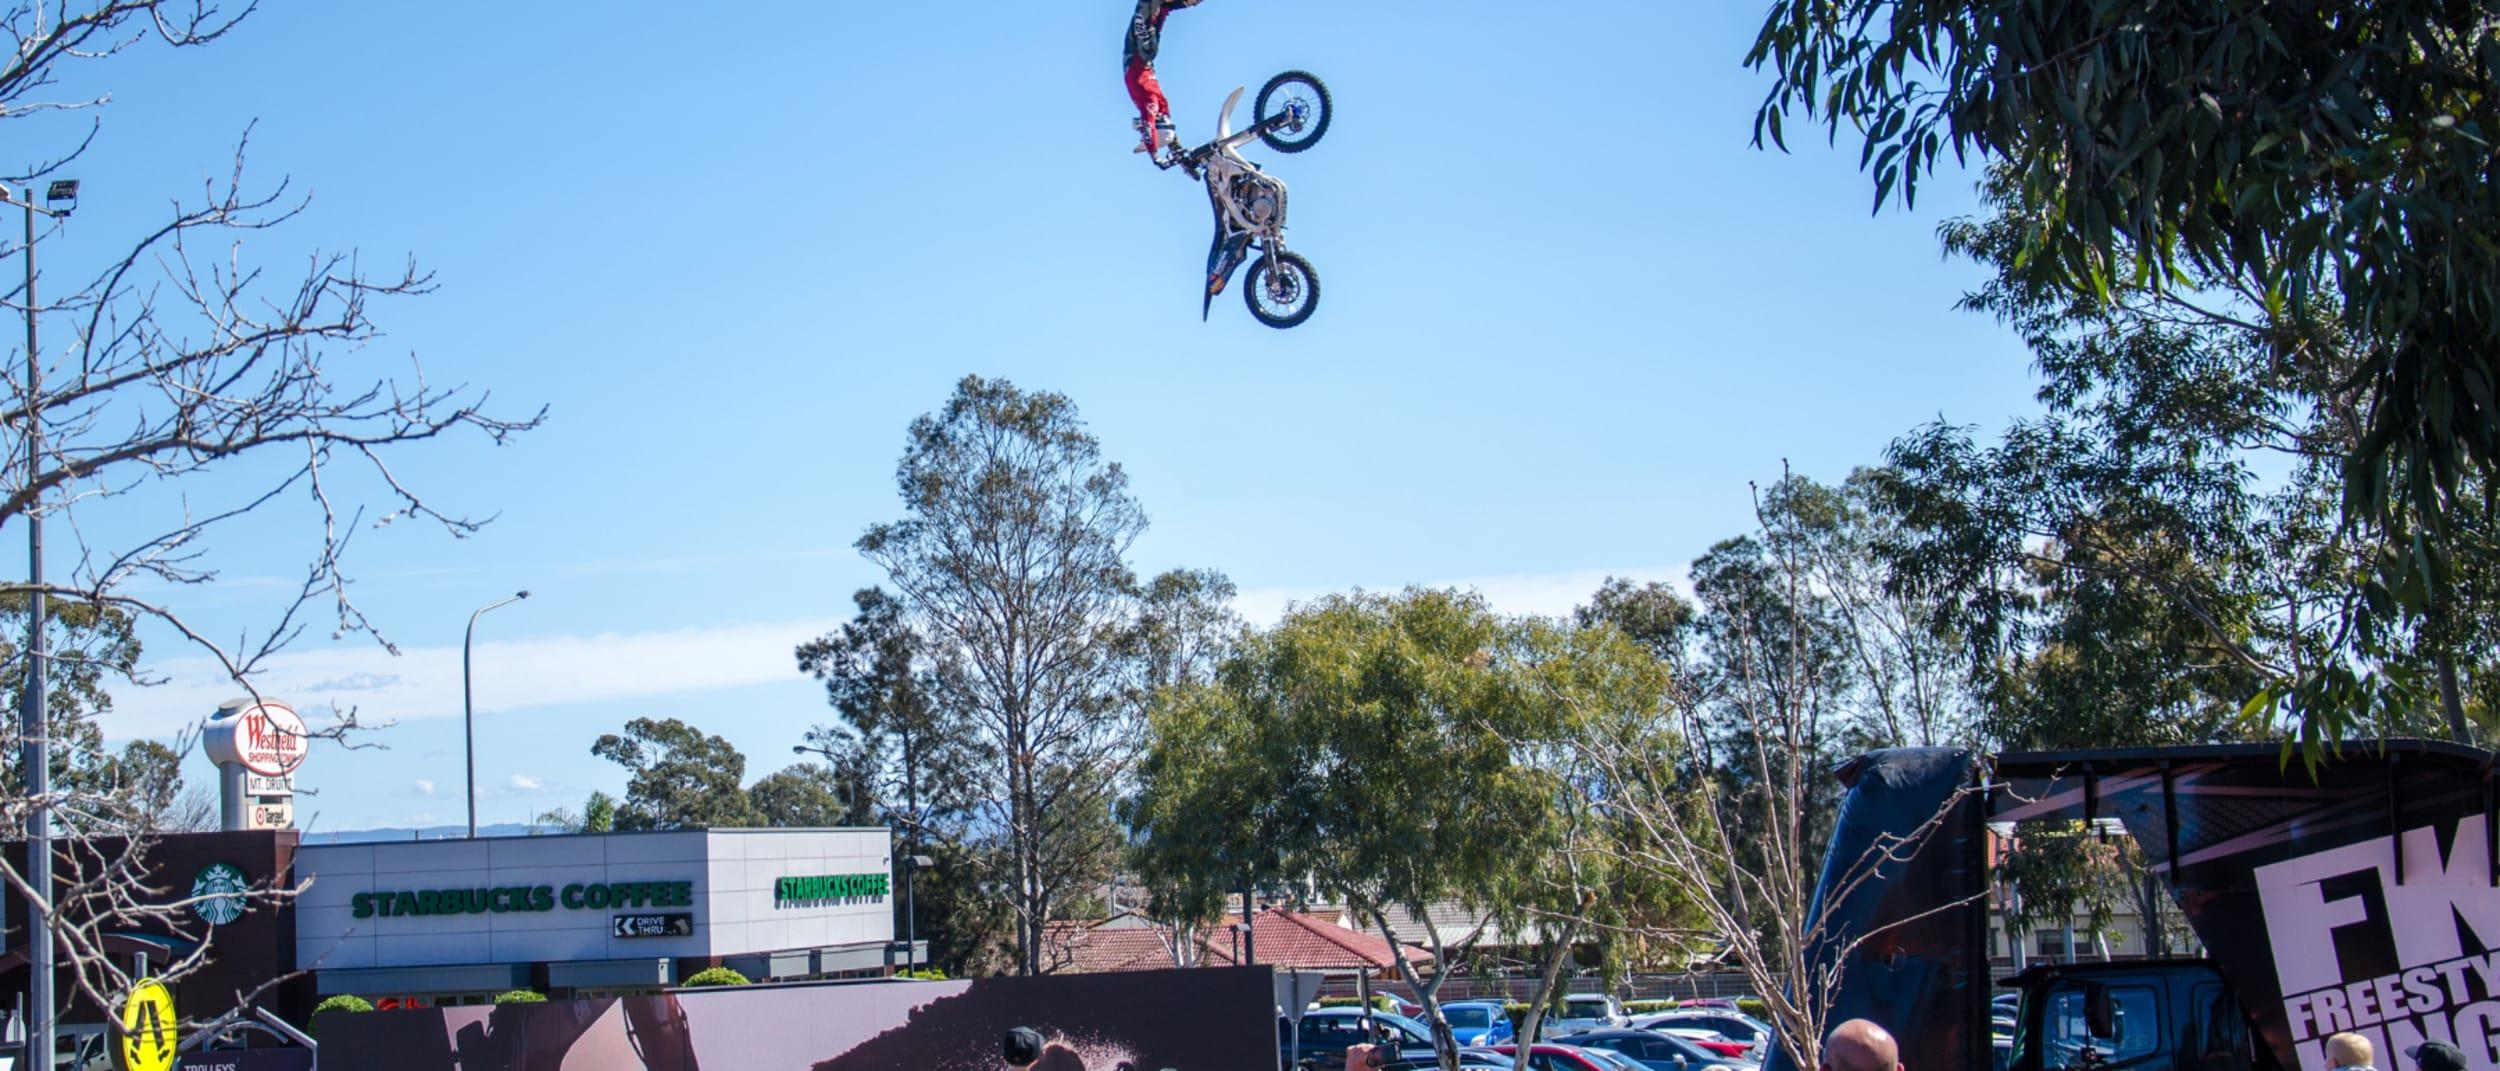 Australian Freestyle Kings motocross show